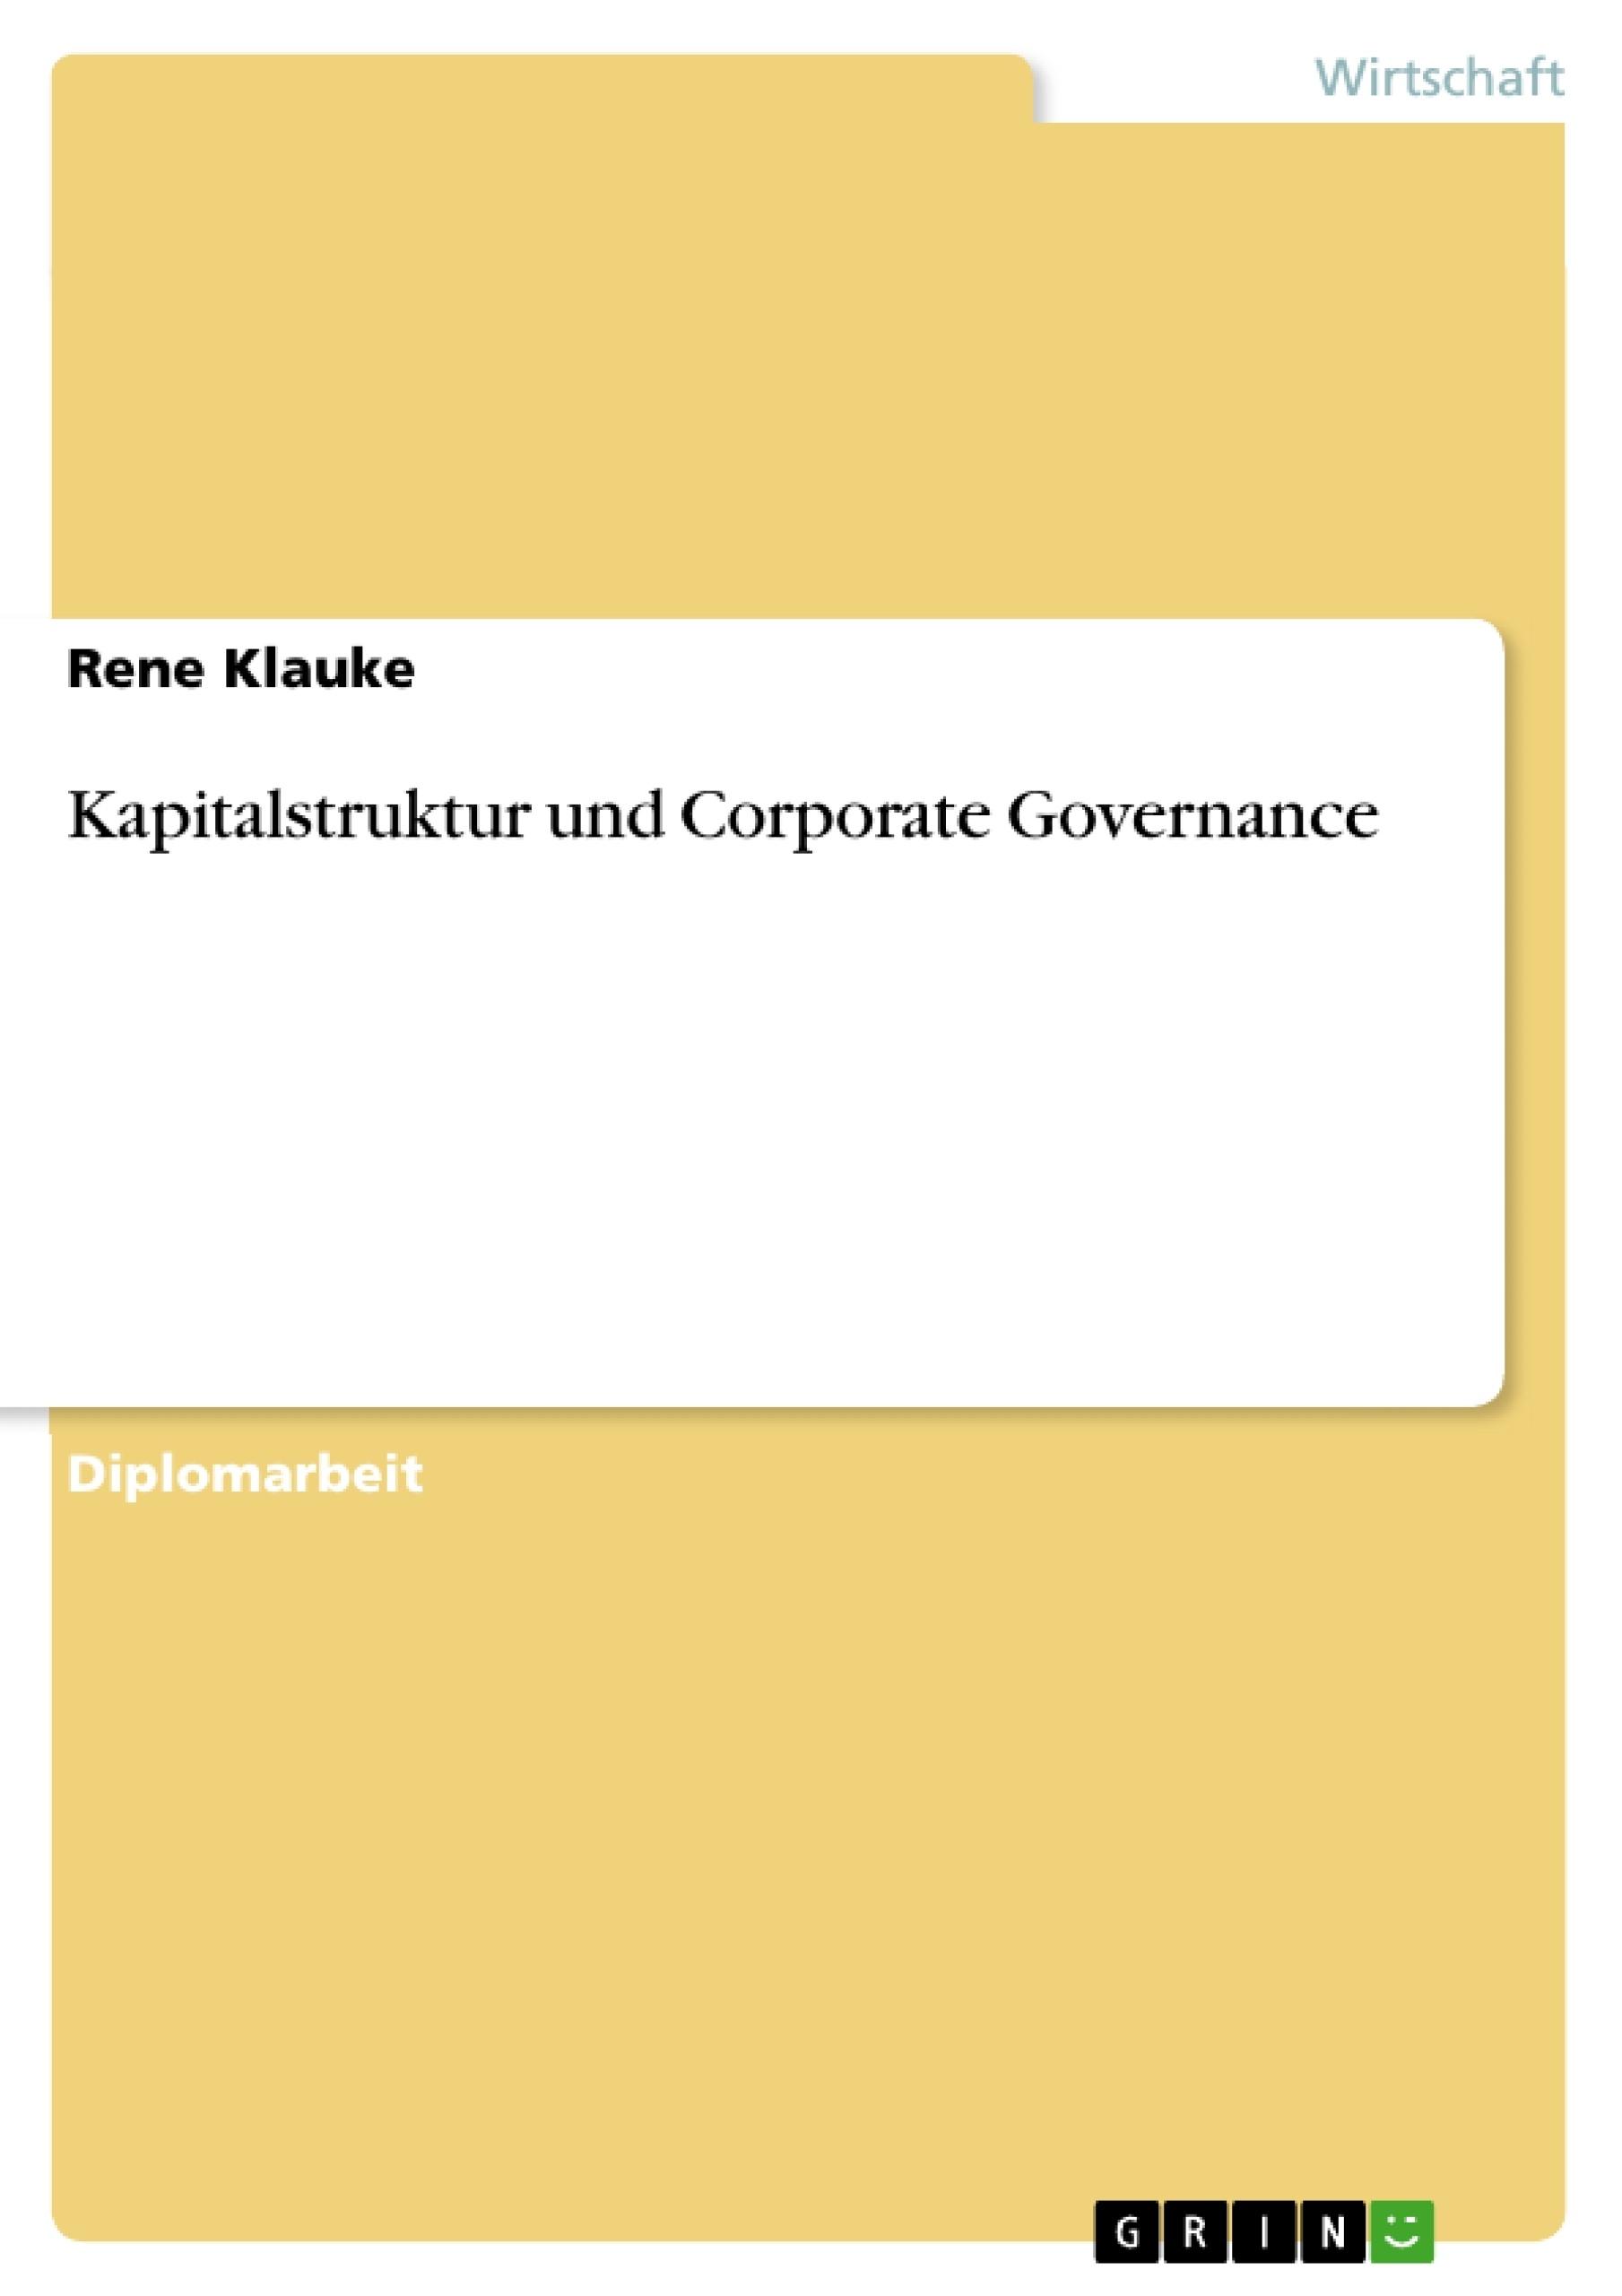 Titel: Kapitalstruktur und Corporate Governance